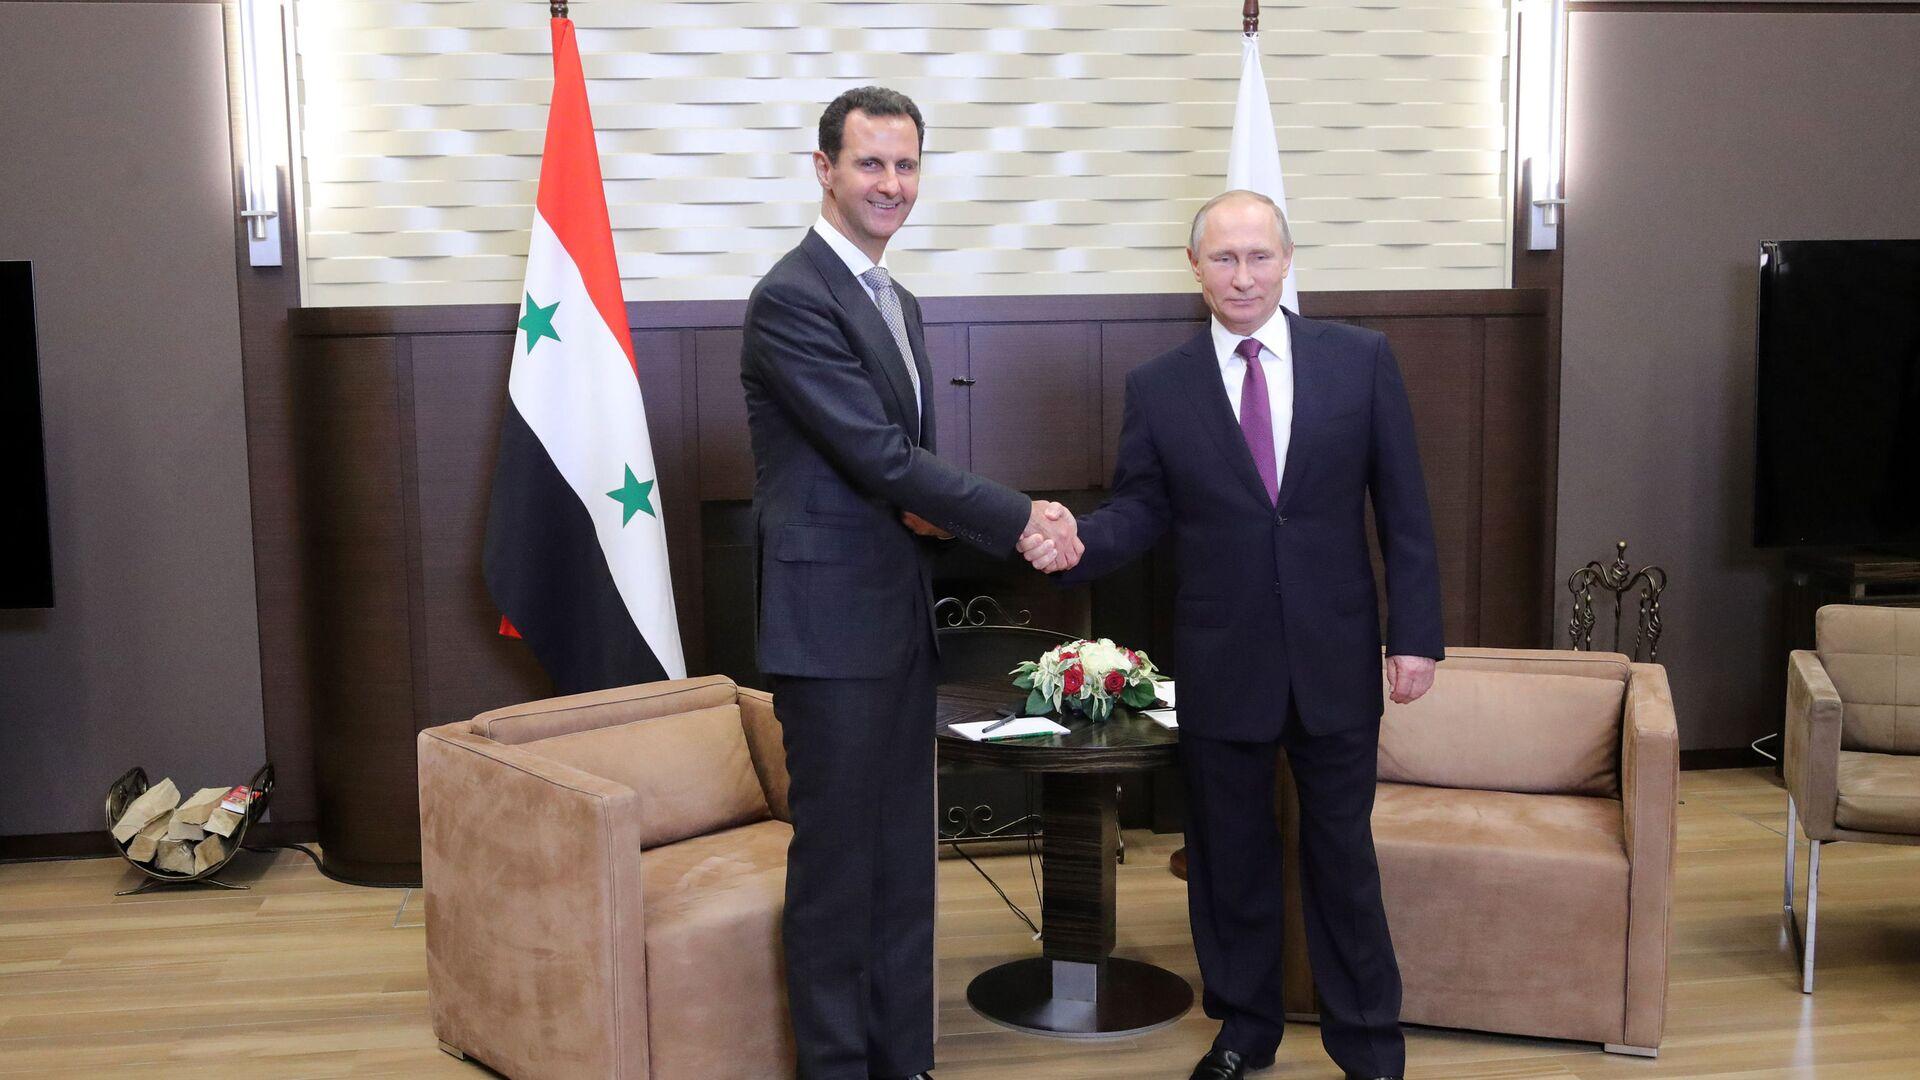 Vladimir Putin meets with Syrian President Bashar Al-Assad - Sputnik International, 1920, 14.09.2021